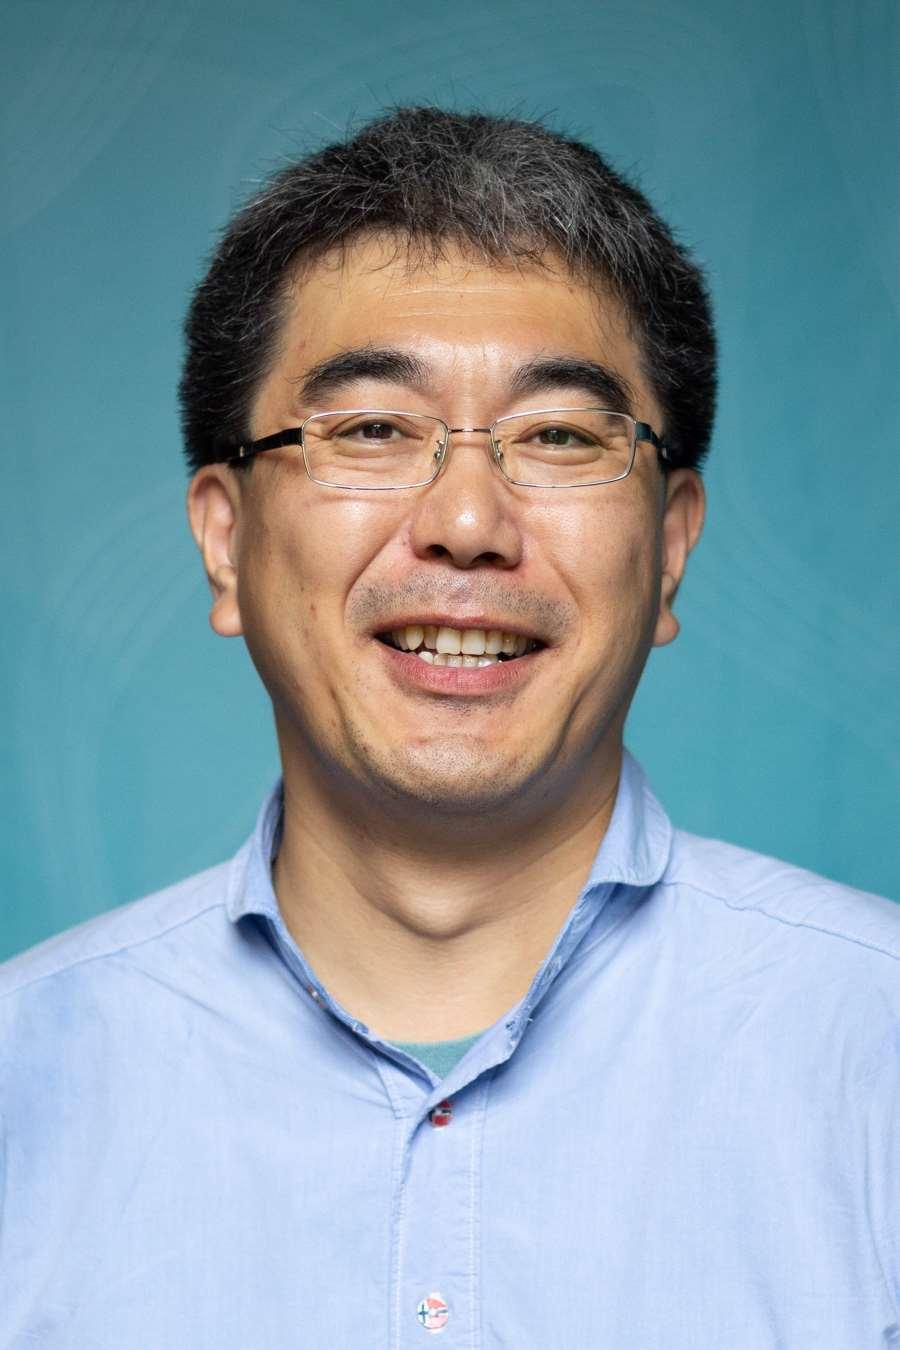 Global Fellow Atsushi Tago Wins JSPS Prize 2019